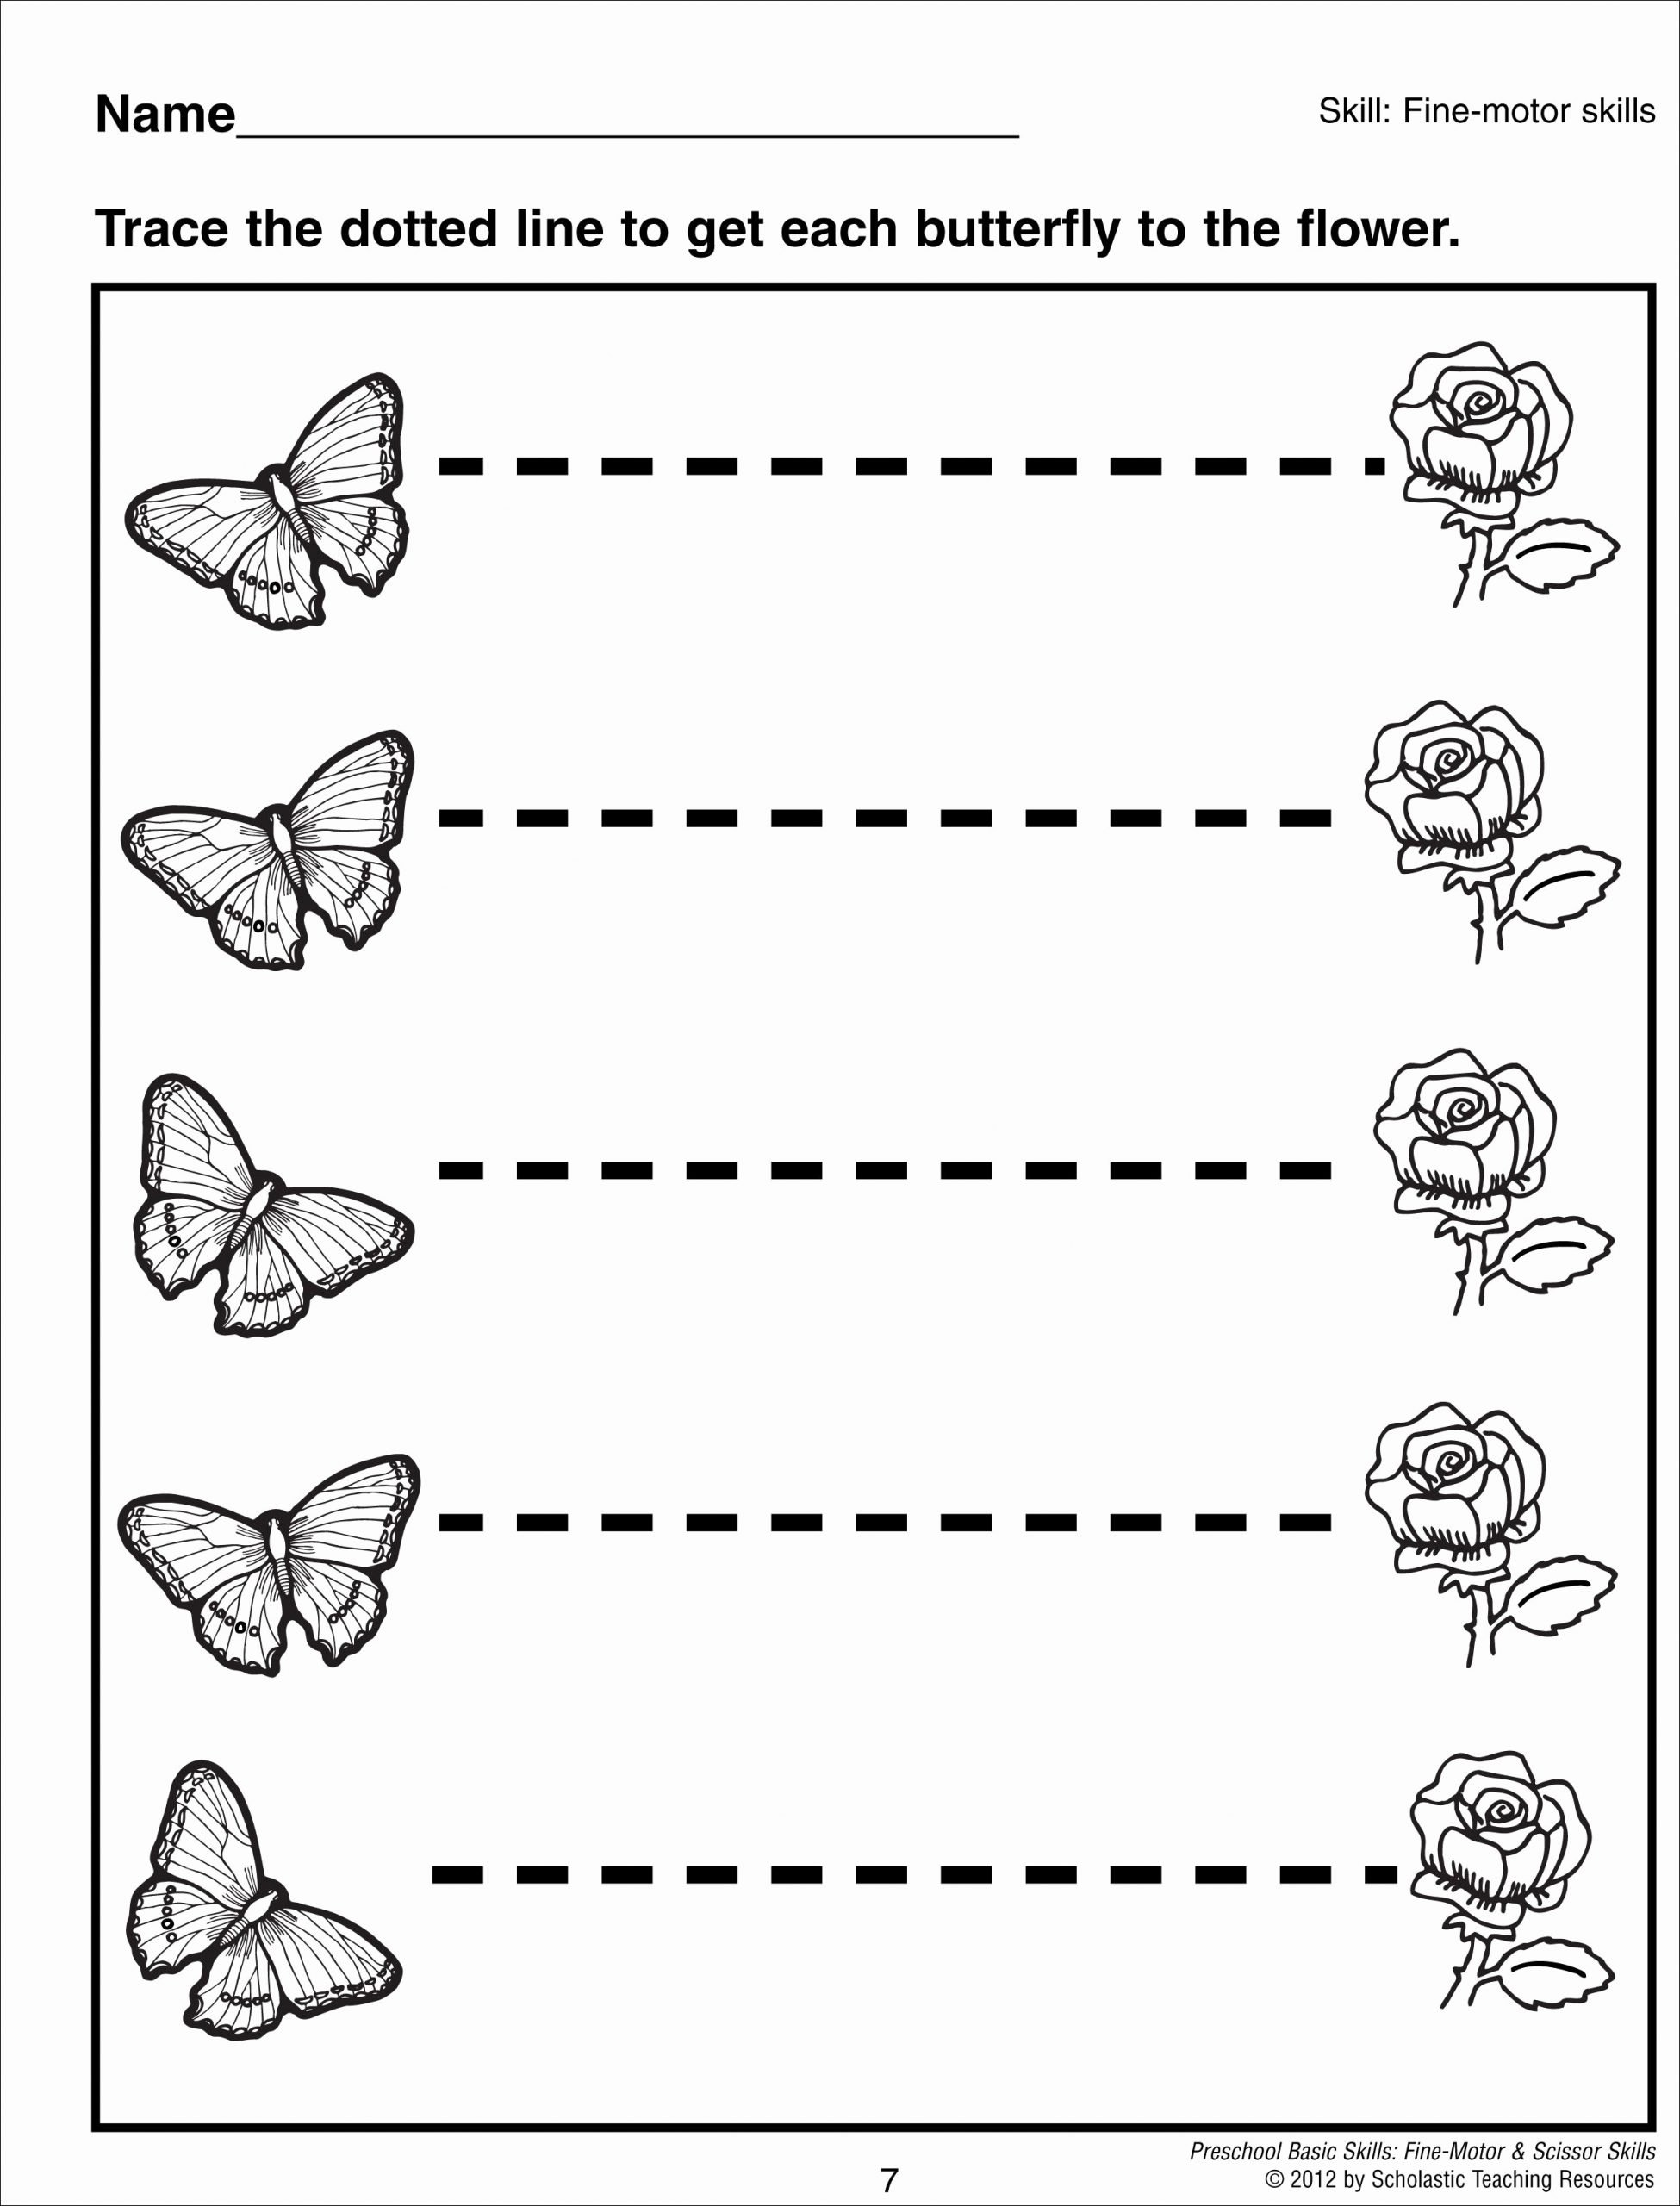 Tracing Lines Worksheets for Preschoolers top Tracing Horizontal Lines Preschool Basic Skills Fine Motor